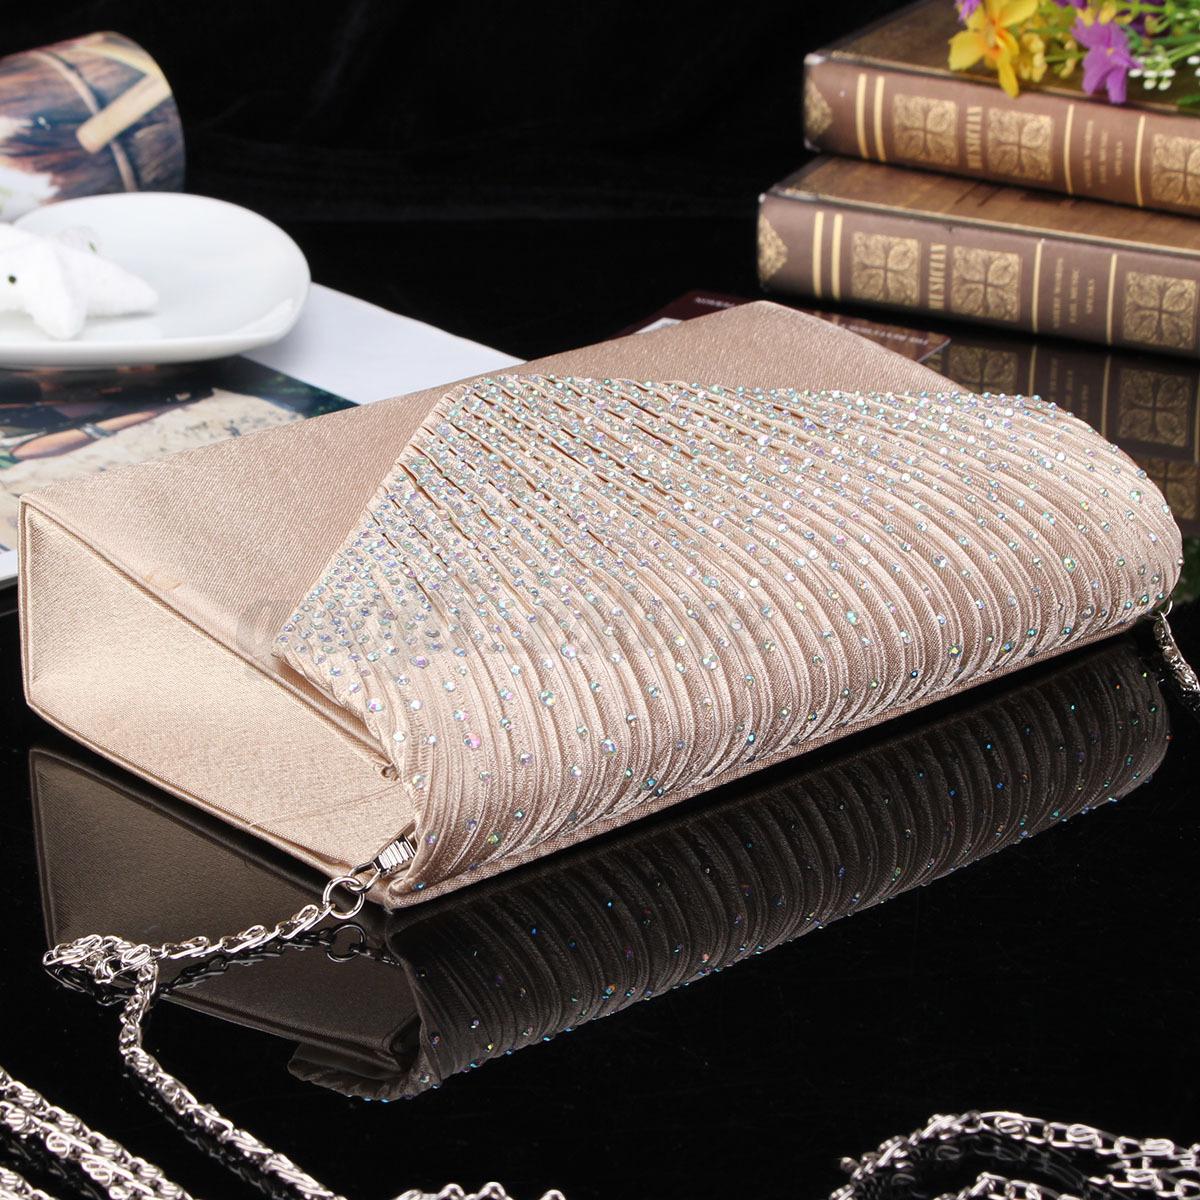 US-Women-Evening-Bag-Satin-Bridal-Clutch-Party-Envelope-Bag-Handbag-Small-Purse thumbnail 6